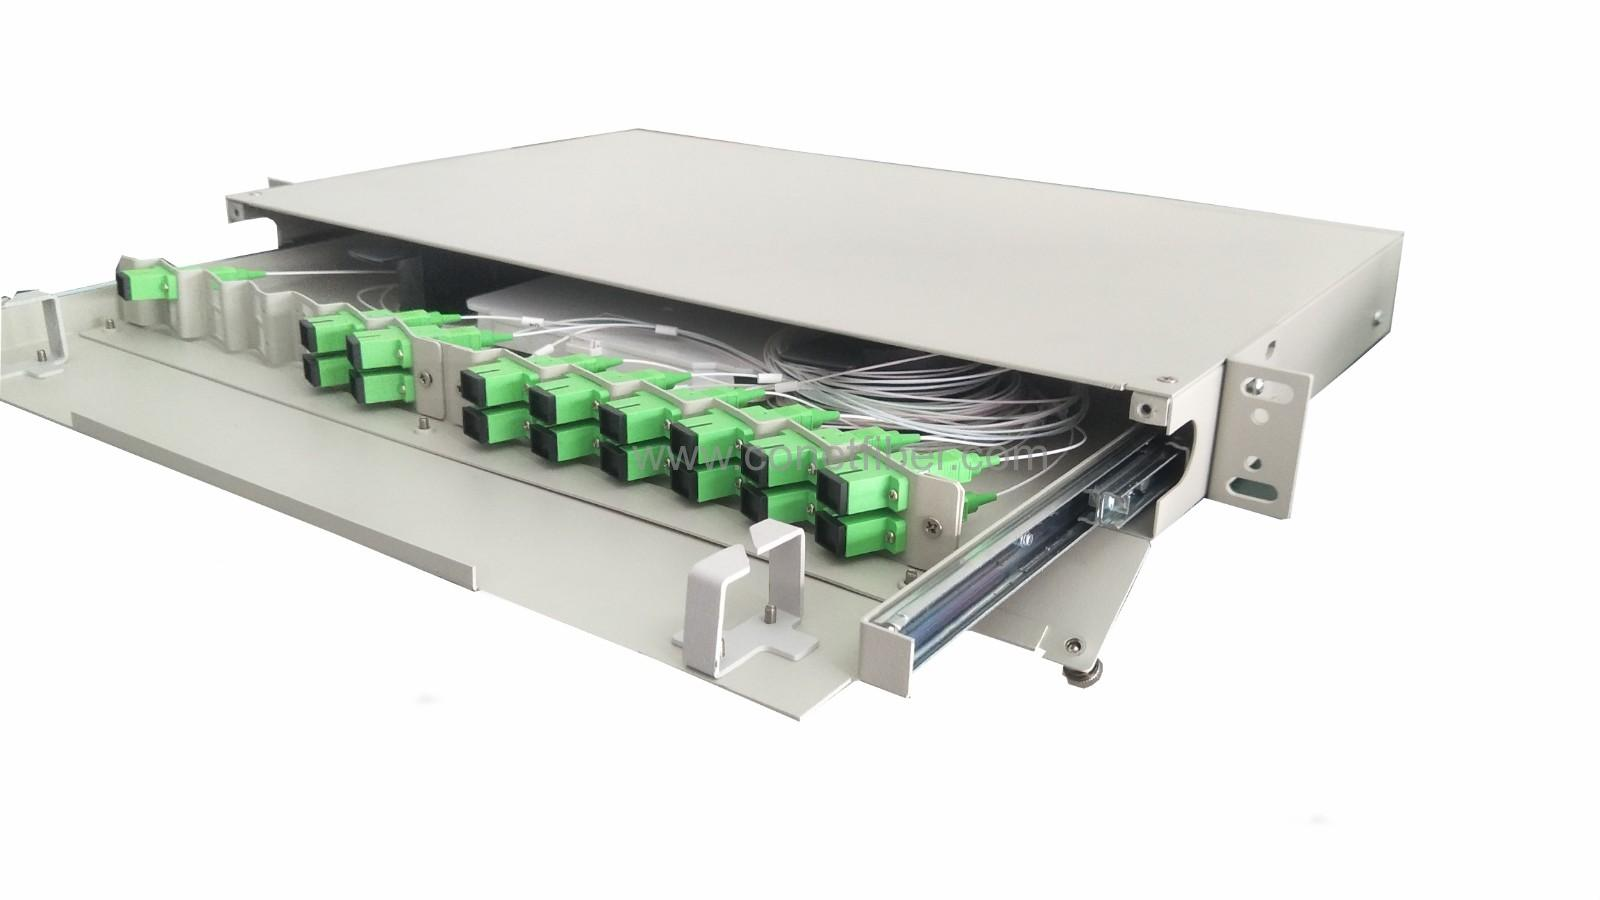 24/32-core Patch Panel